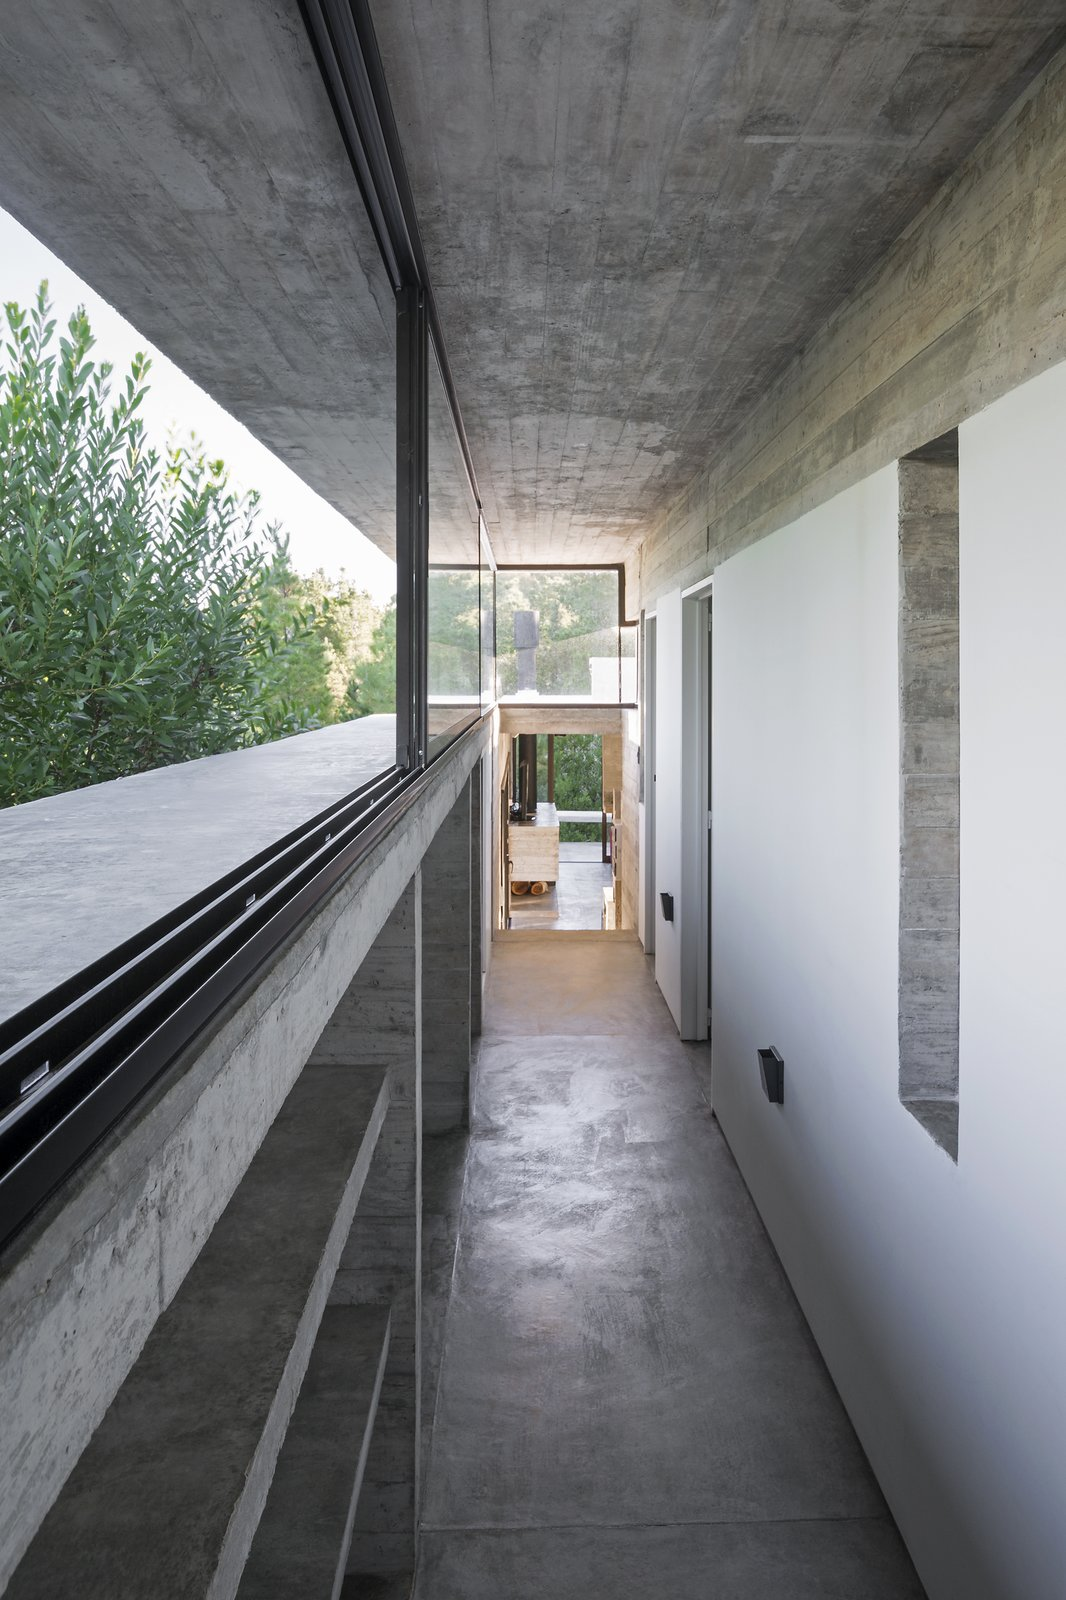 Hallway and Concrete Floor Wein House - Besonías Almeida arquitectos  Wein House by Besonías Almeida arquitectos